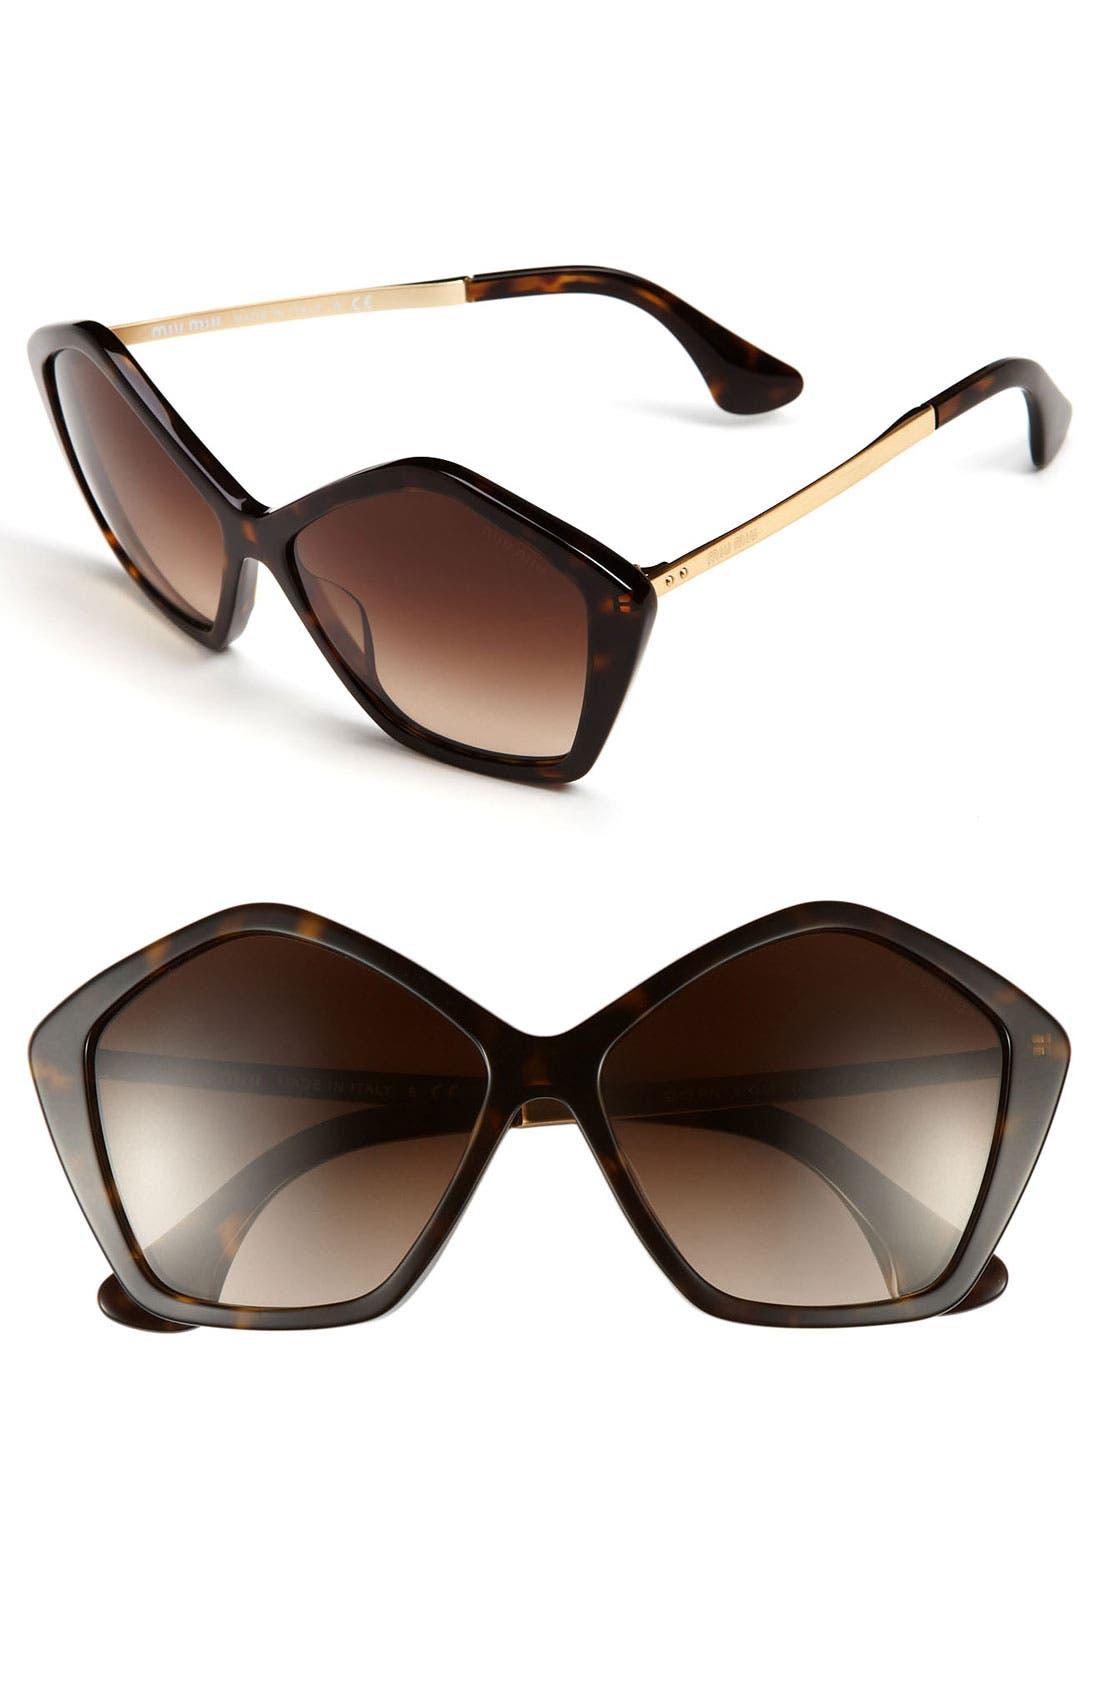 Main Image - Miu Miu 'Culte Collection' 57mm Geometric Sunglasses